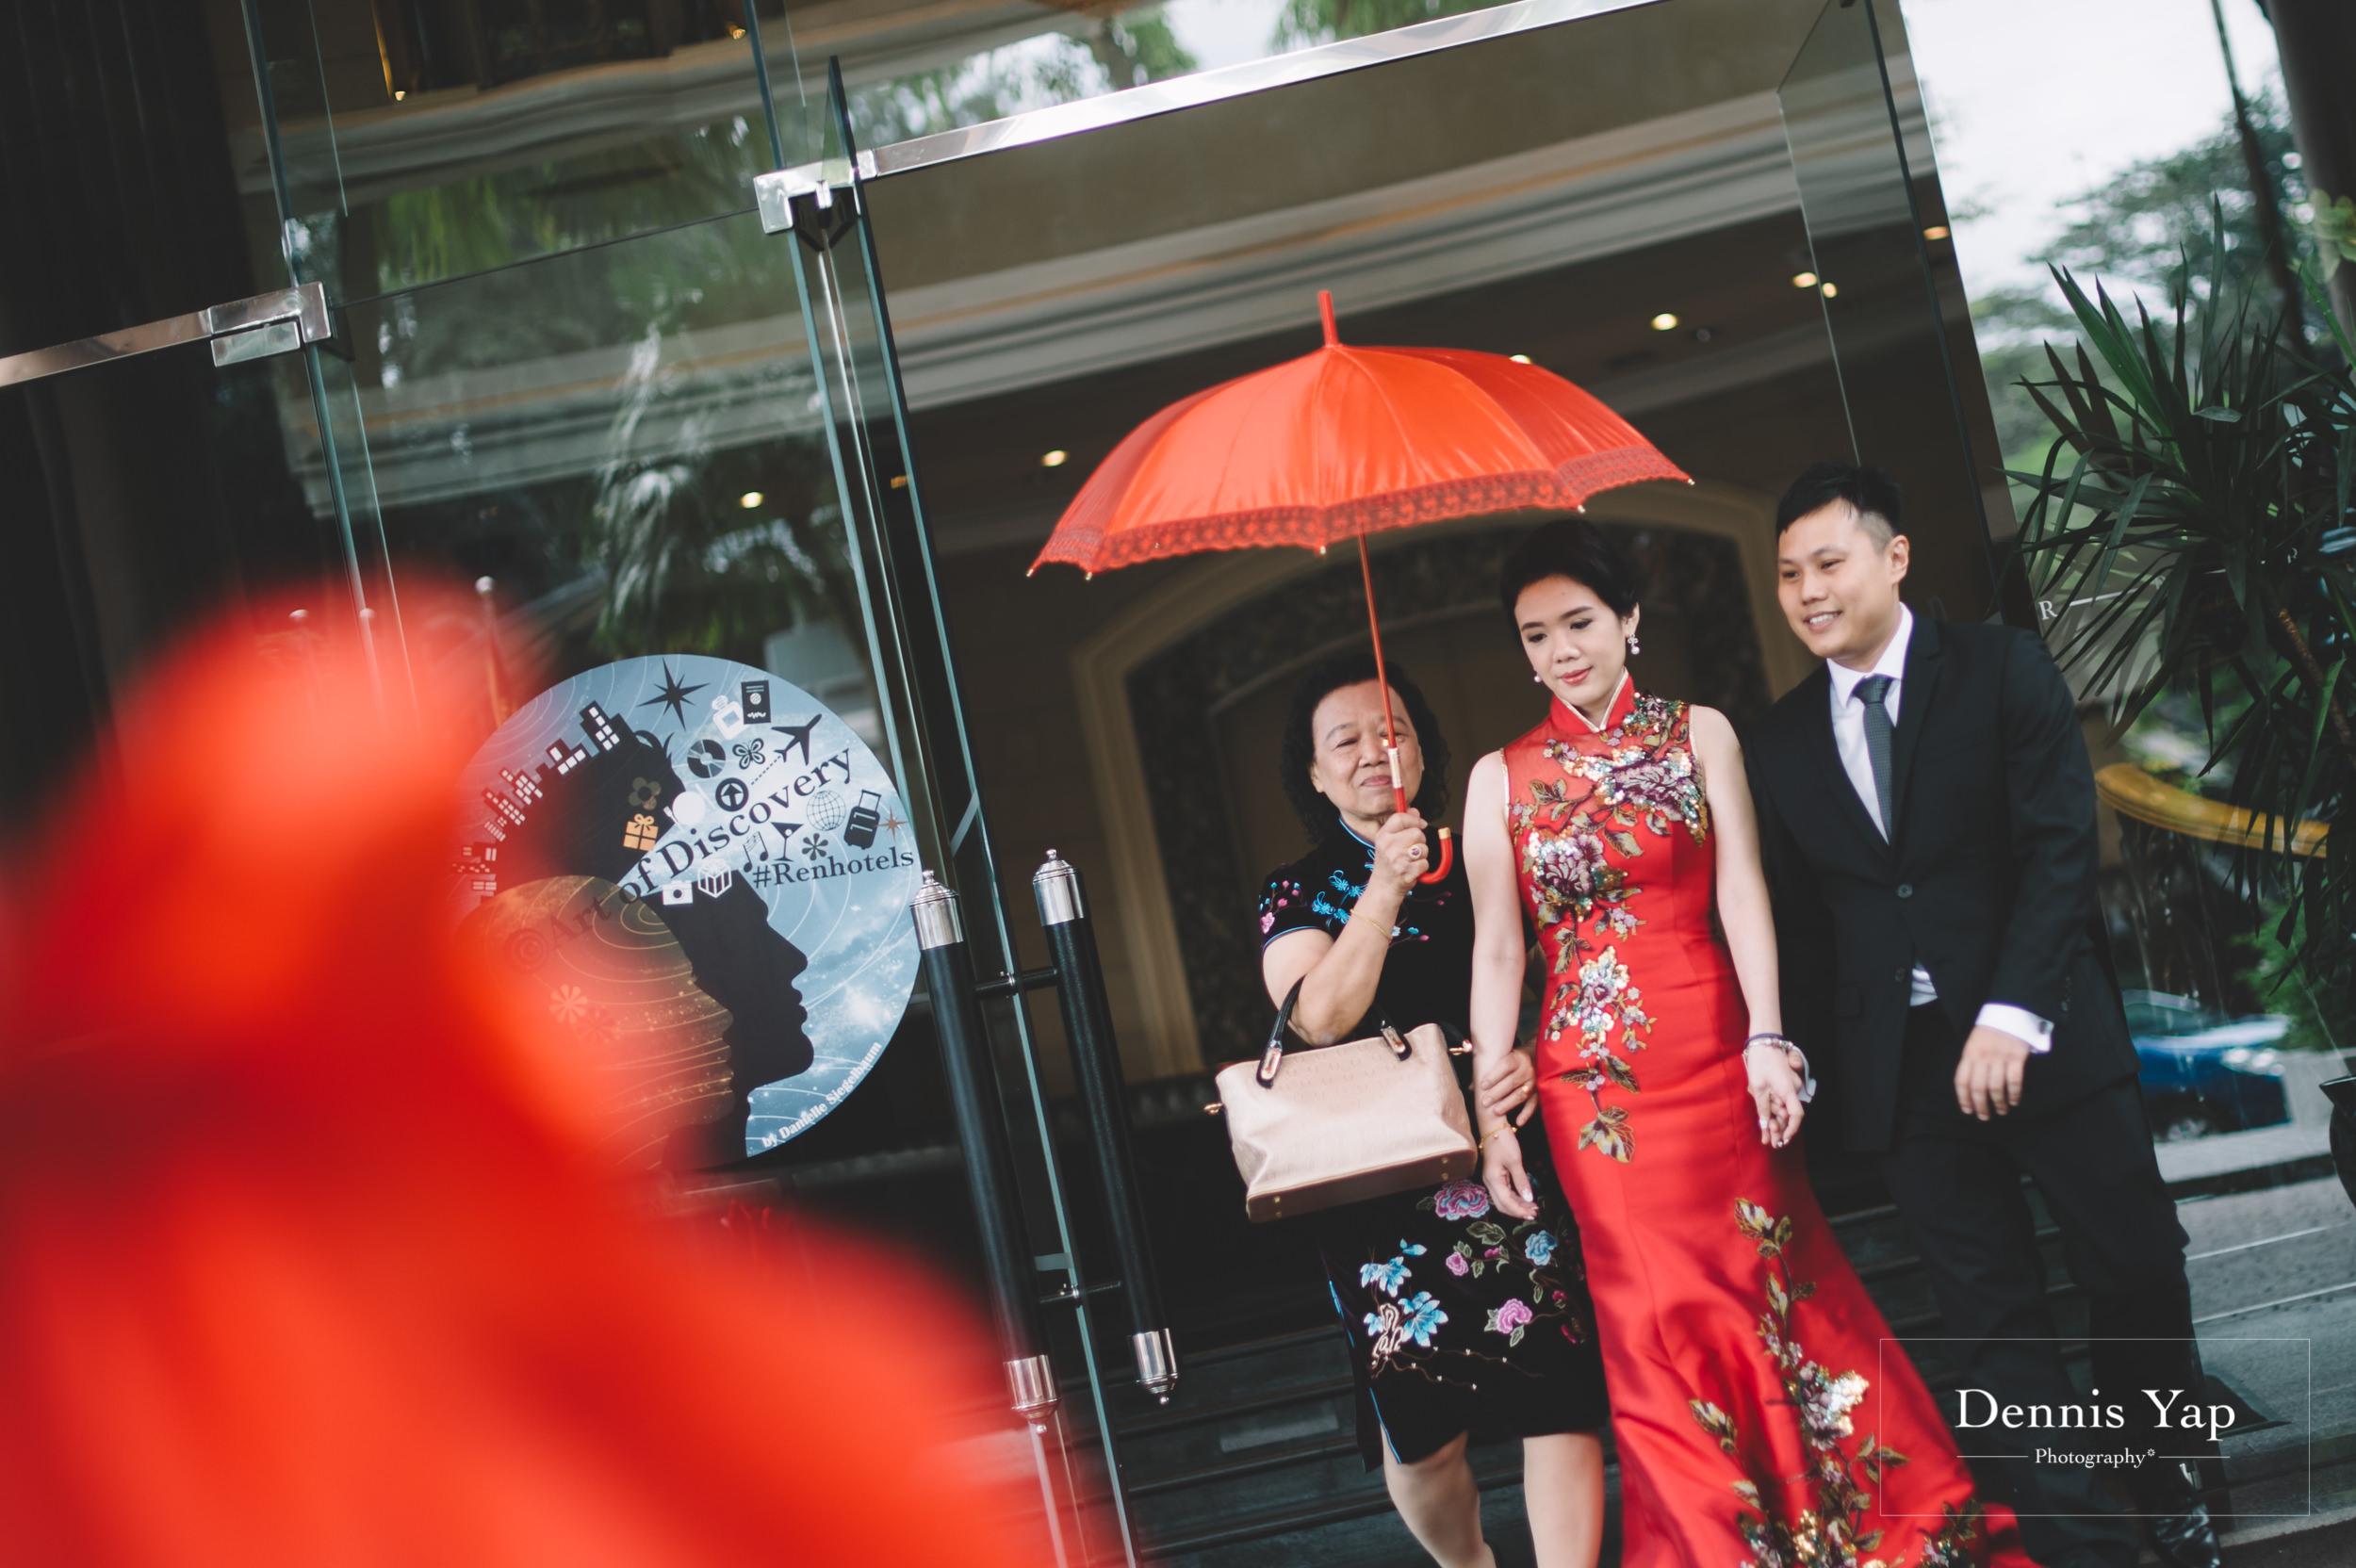 vincent peggy wedding dinner neo tamarind kuala lumpur dennis yap photography-6.jpg